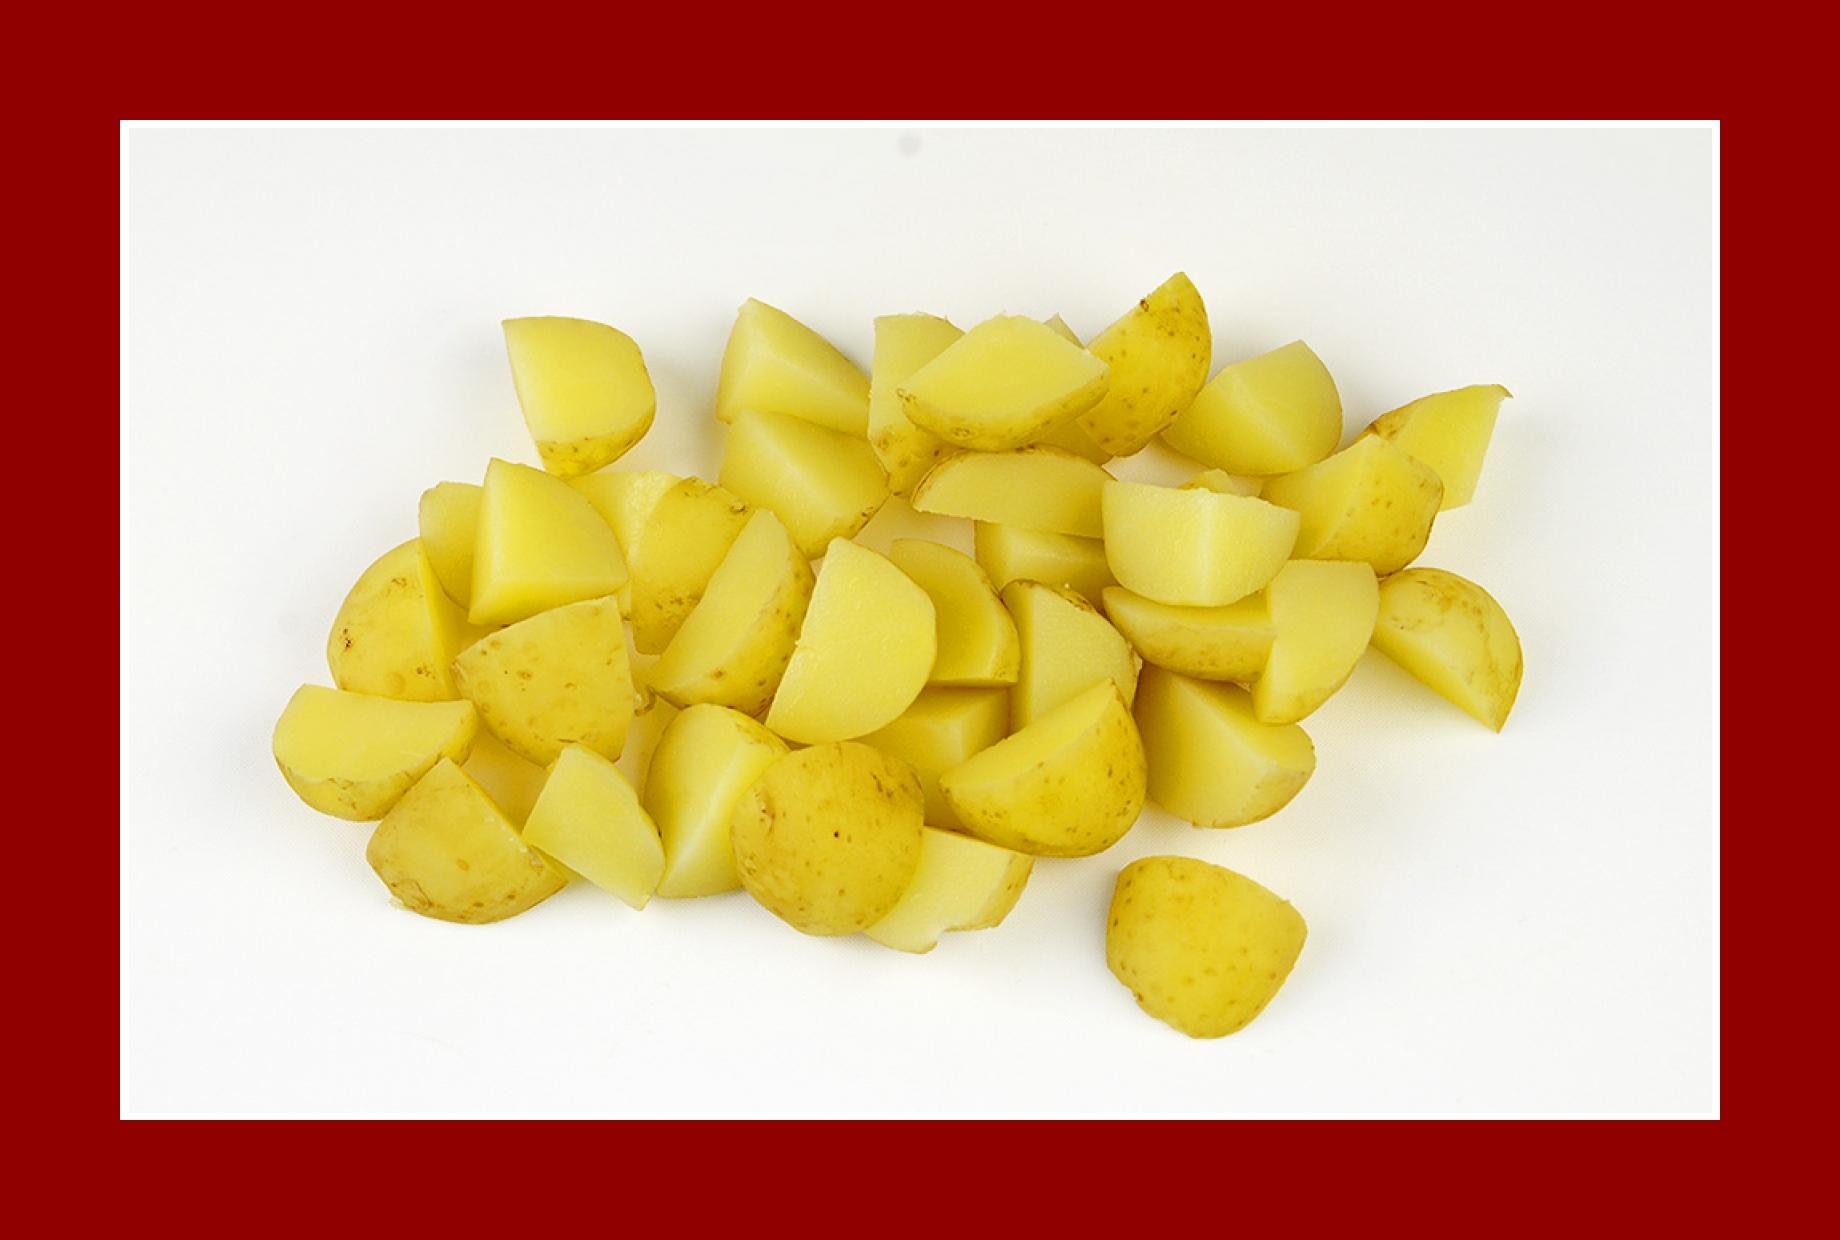 Sommersalat leckerer Salat Kartoffelsalat mit Frühkartoffeln